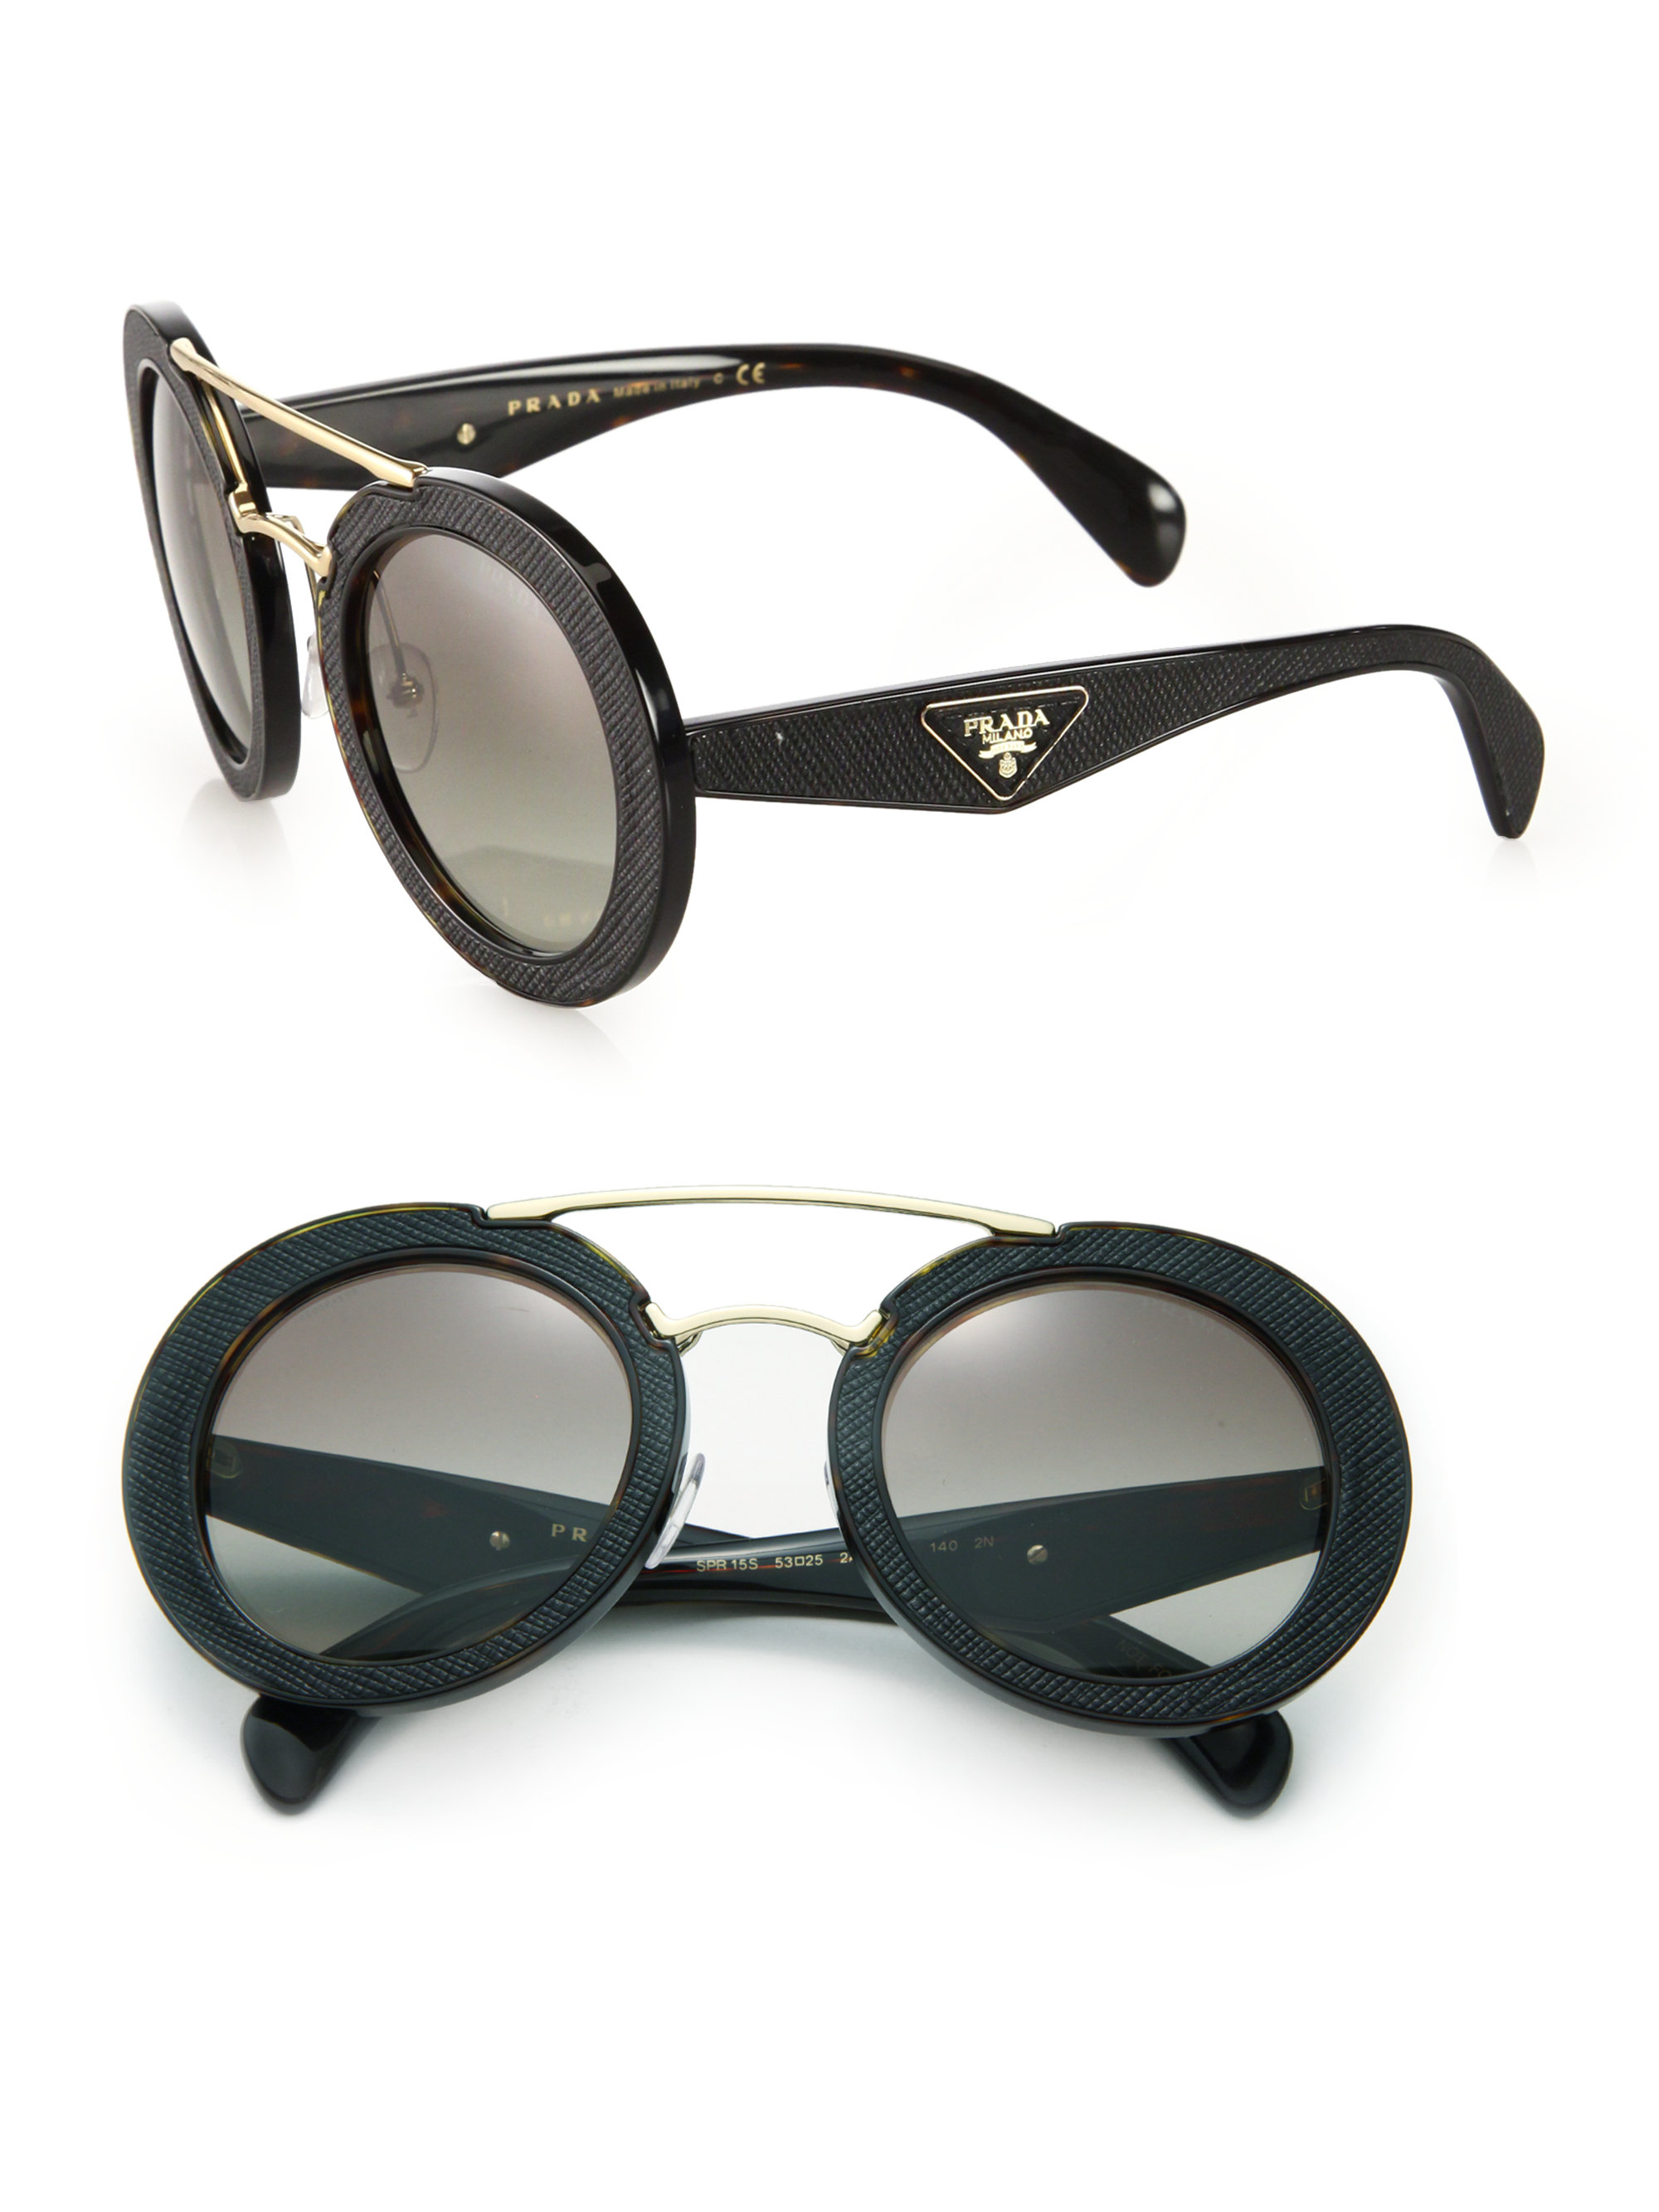 6d91911fd212 Lyst - Prada Ornate 15ss 53mm Saffiano Leather Round Sunglasses in Black